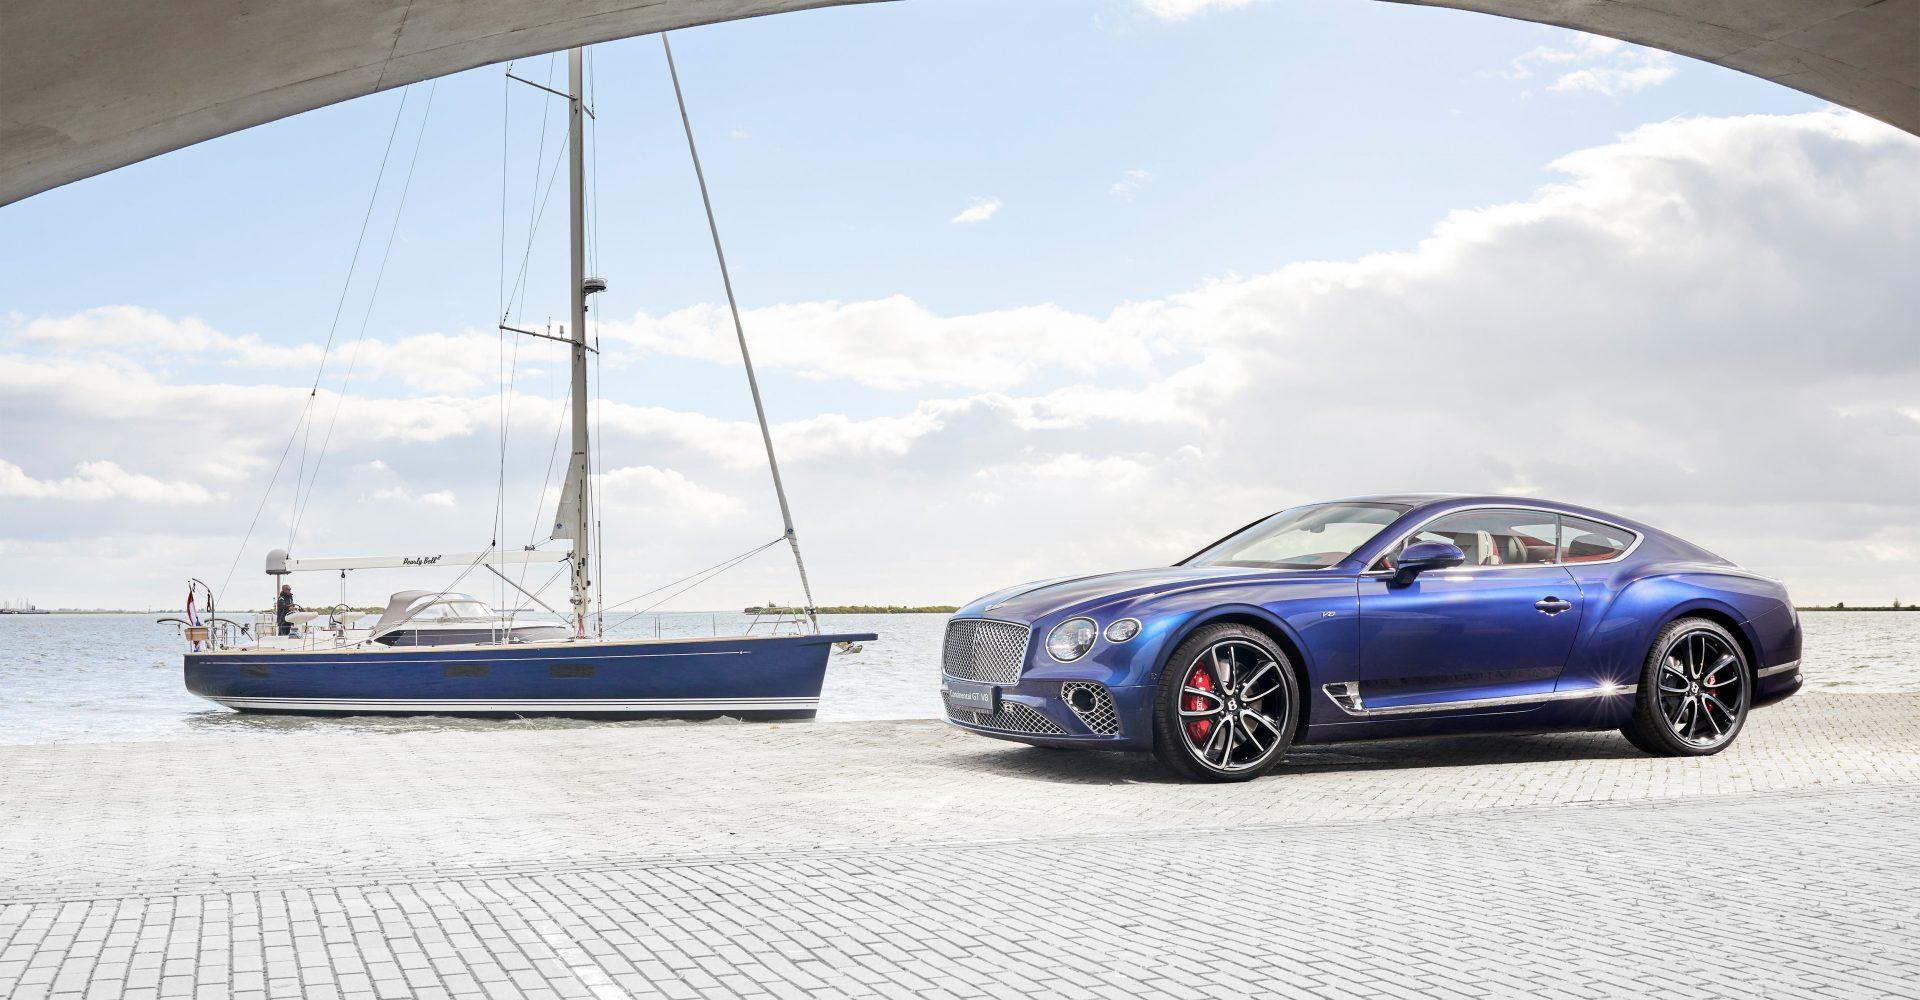 Bentley designs yacht interior to match customer's car